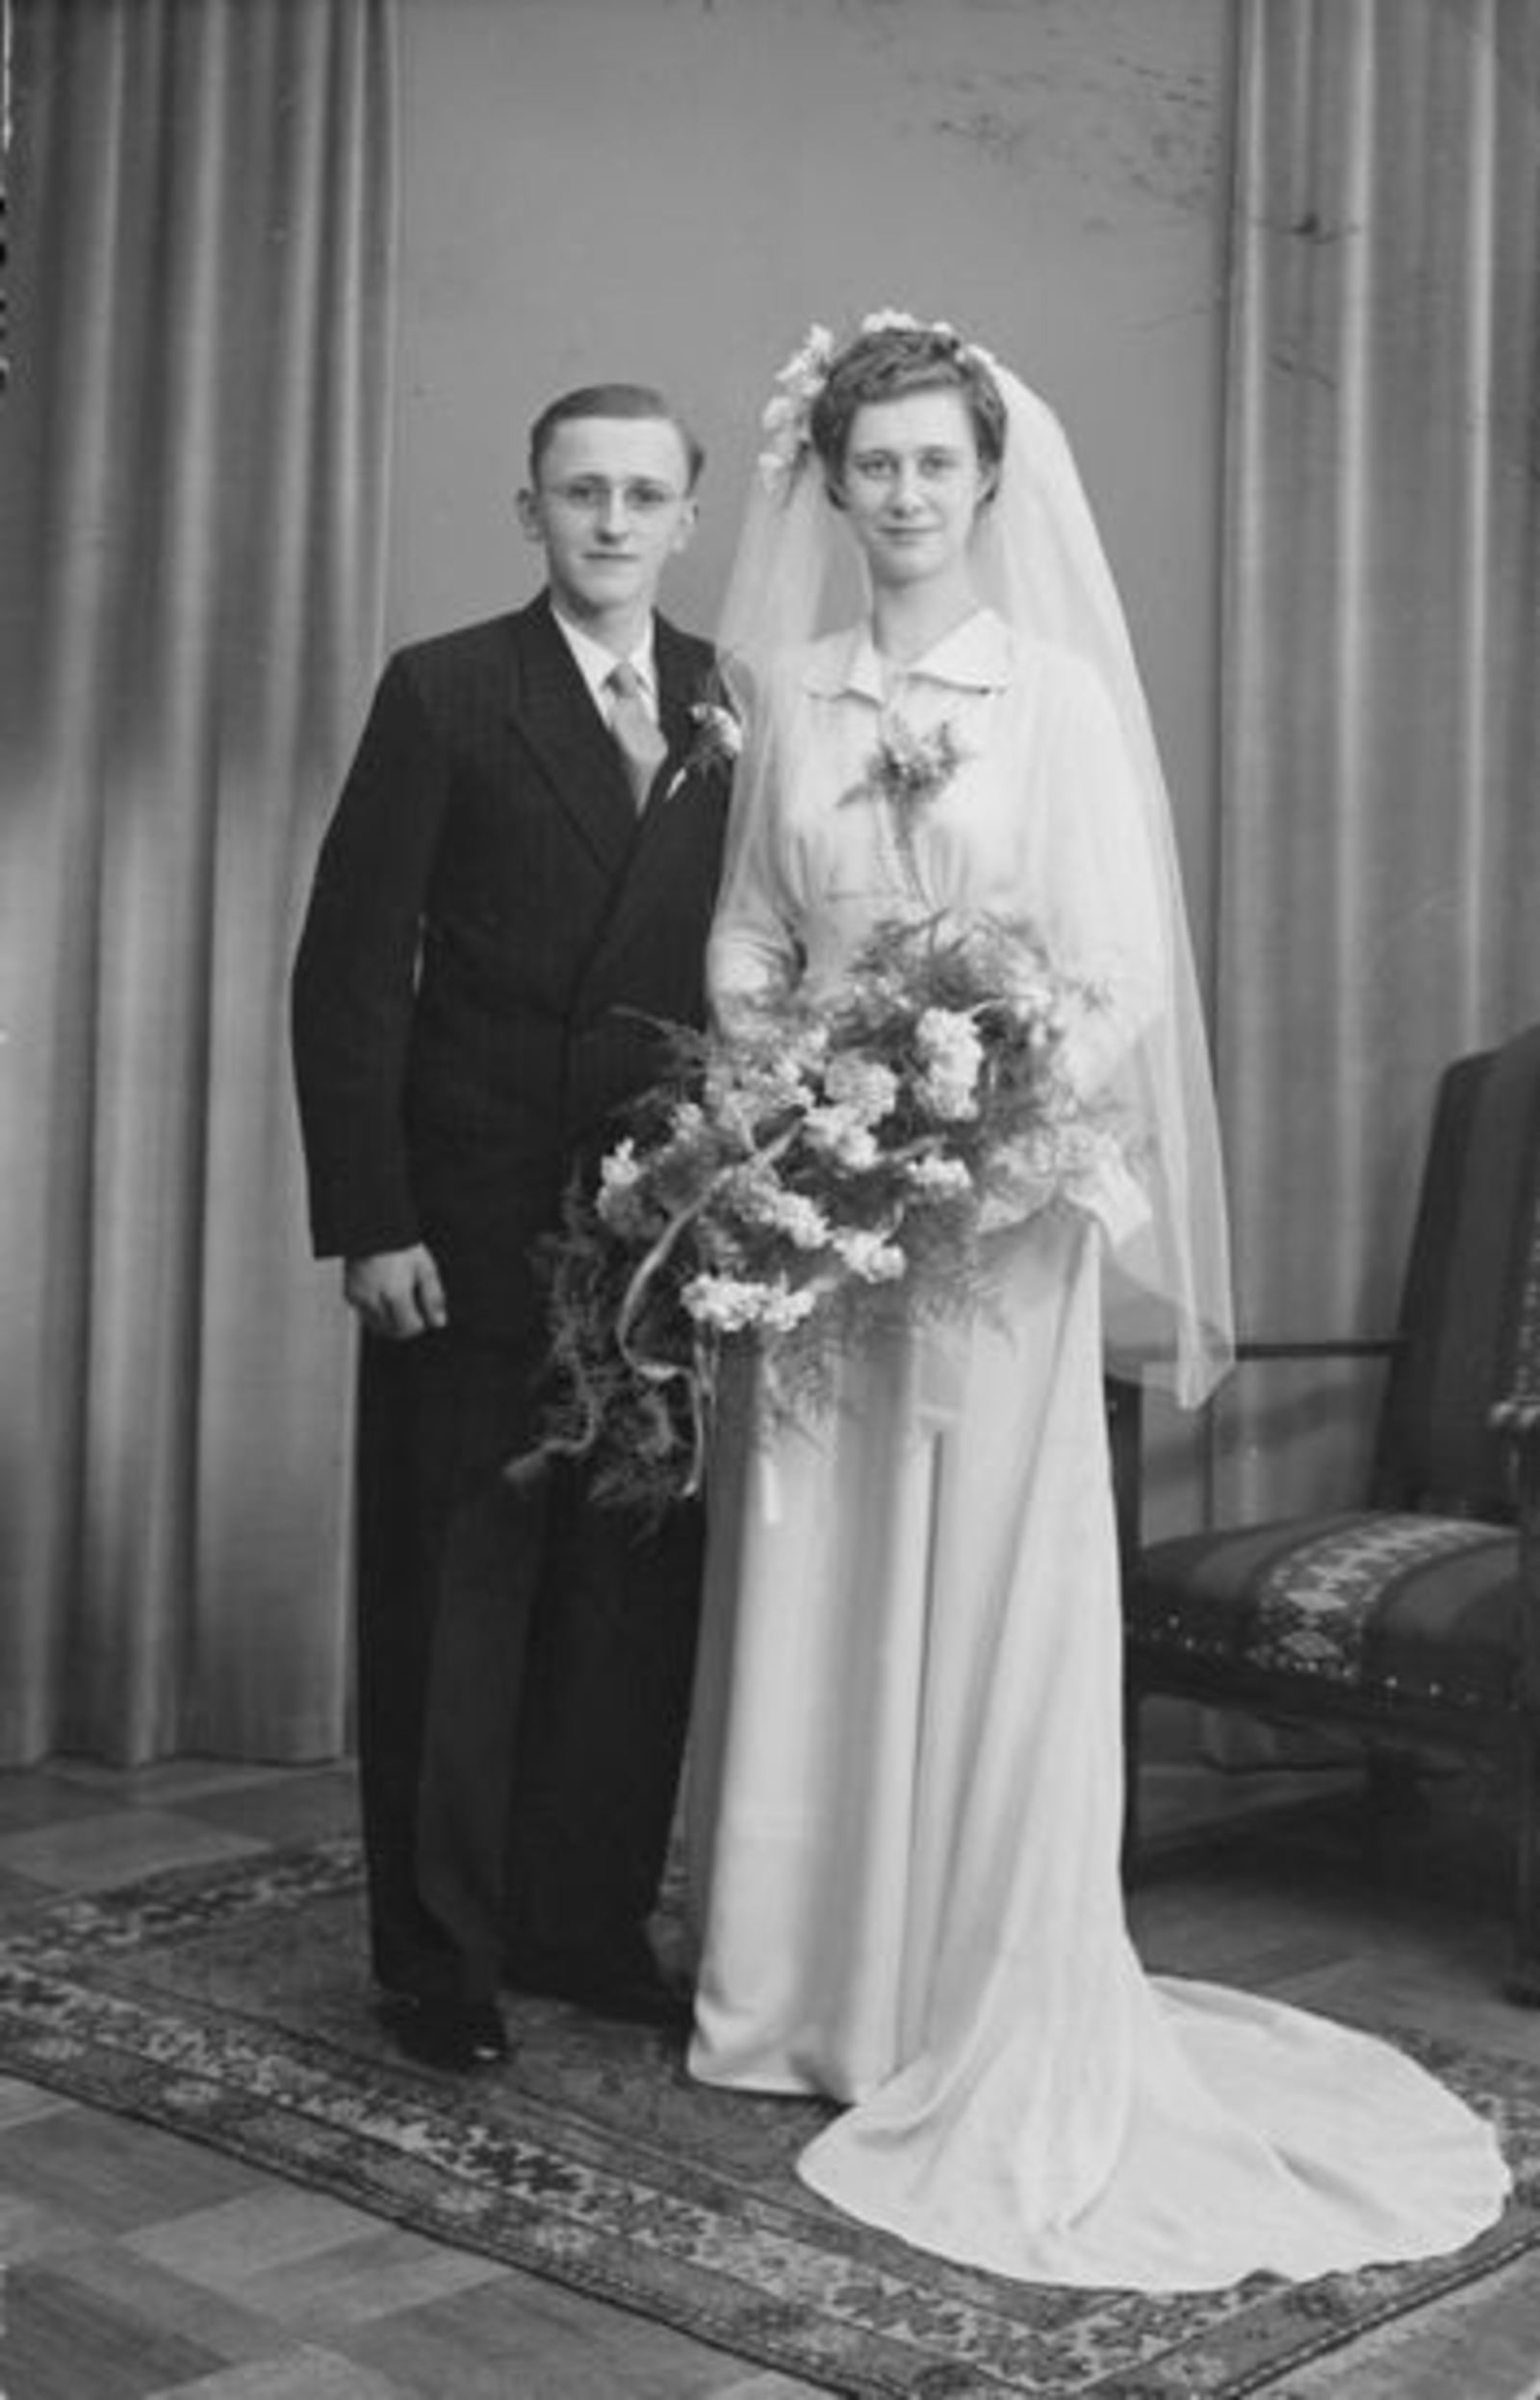 Broere Wim 1929 19__ trouwt met Lenie Lagrouw 01